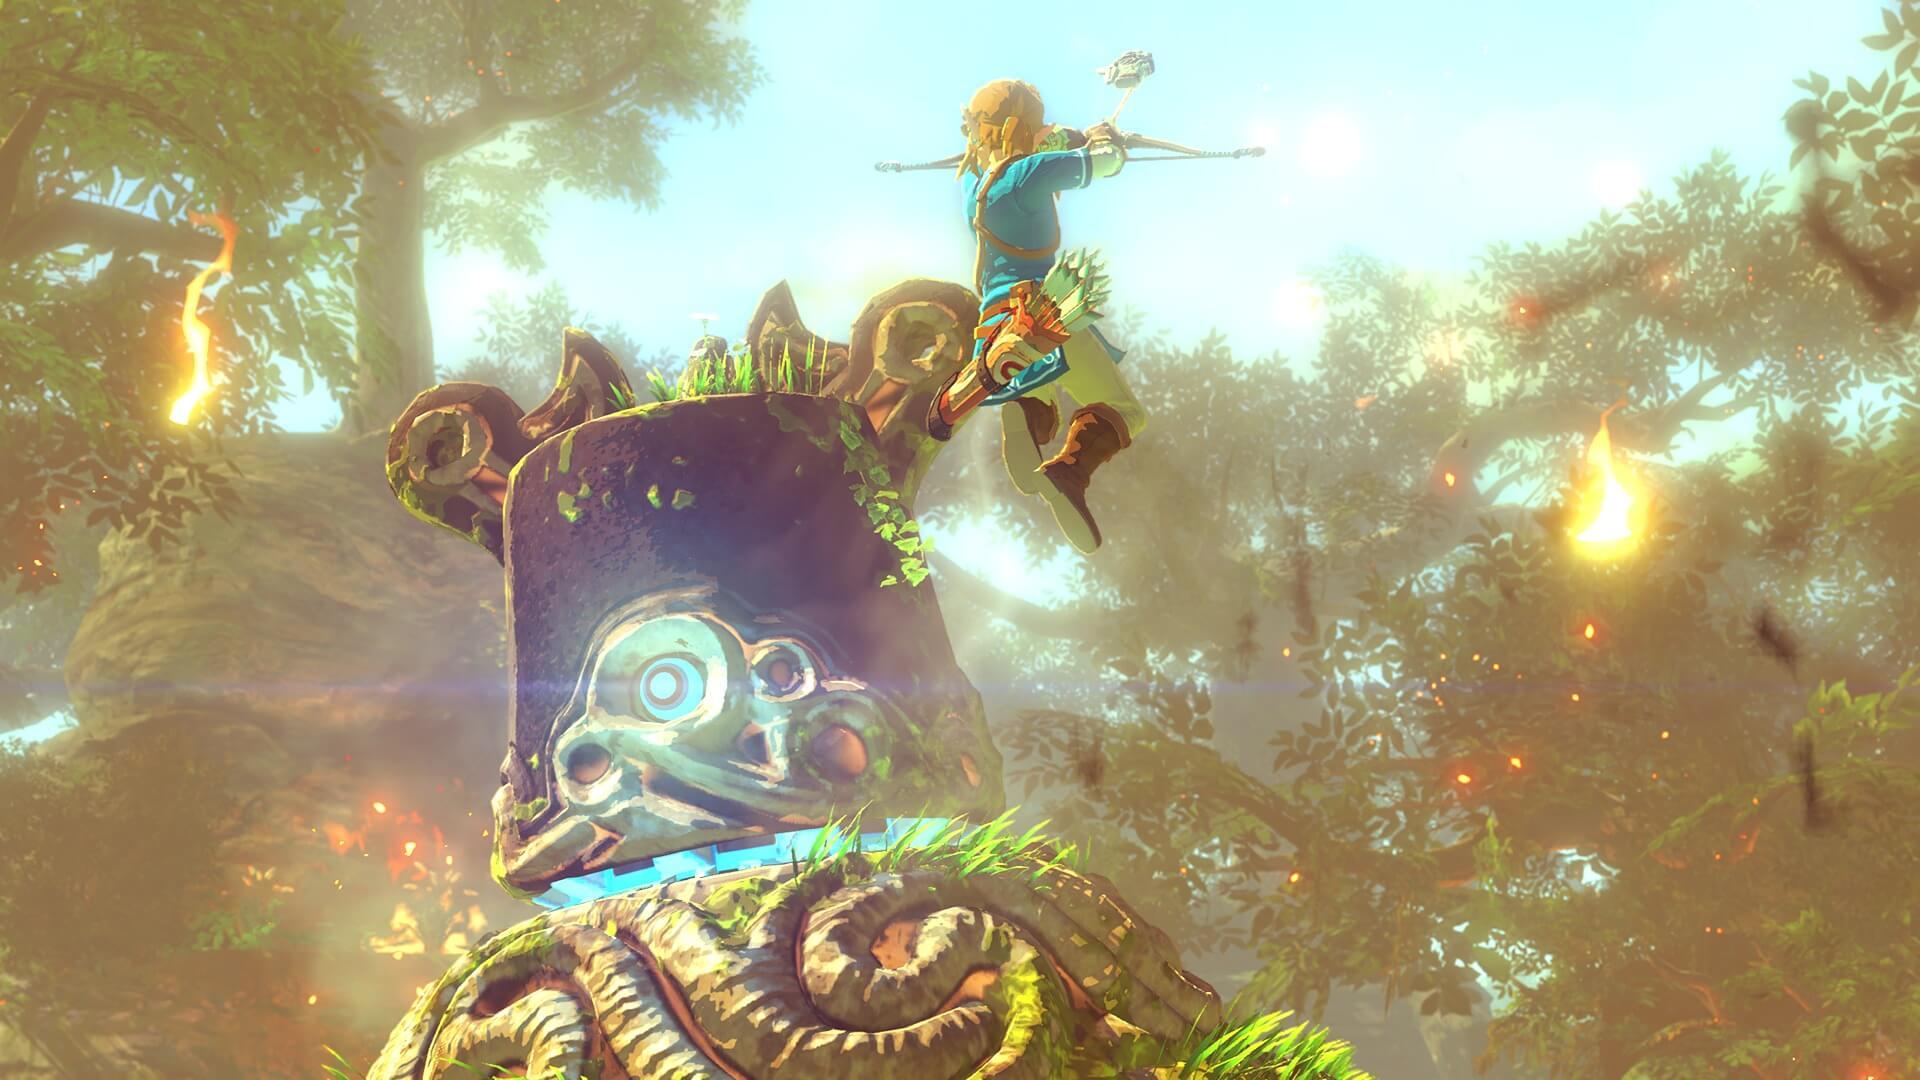 The Legend Of Zelda Breath Of The Wild Looks Like Wind Waker For